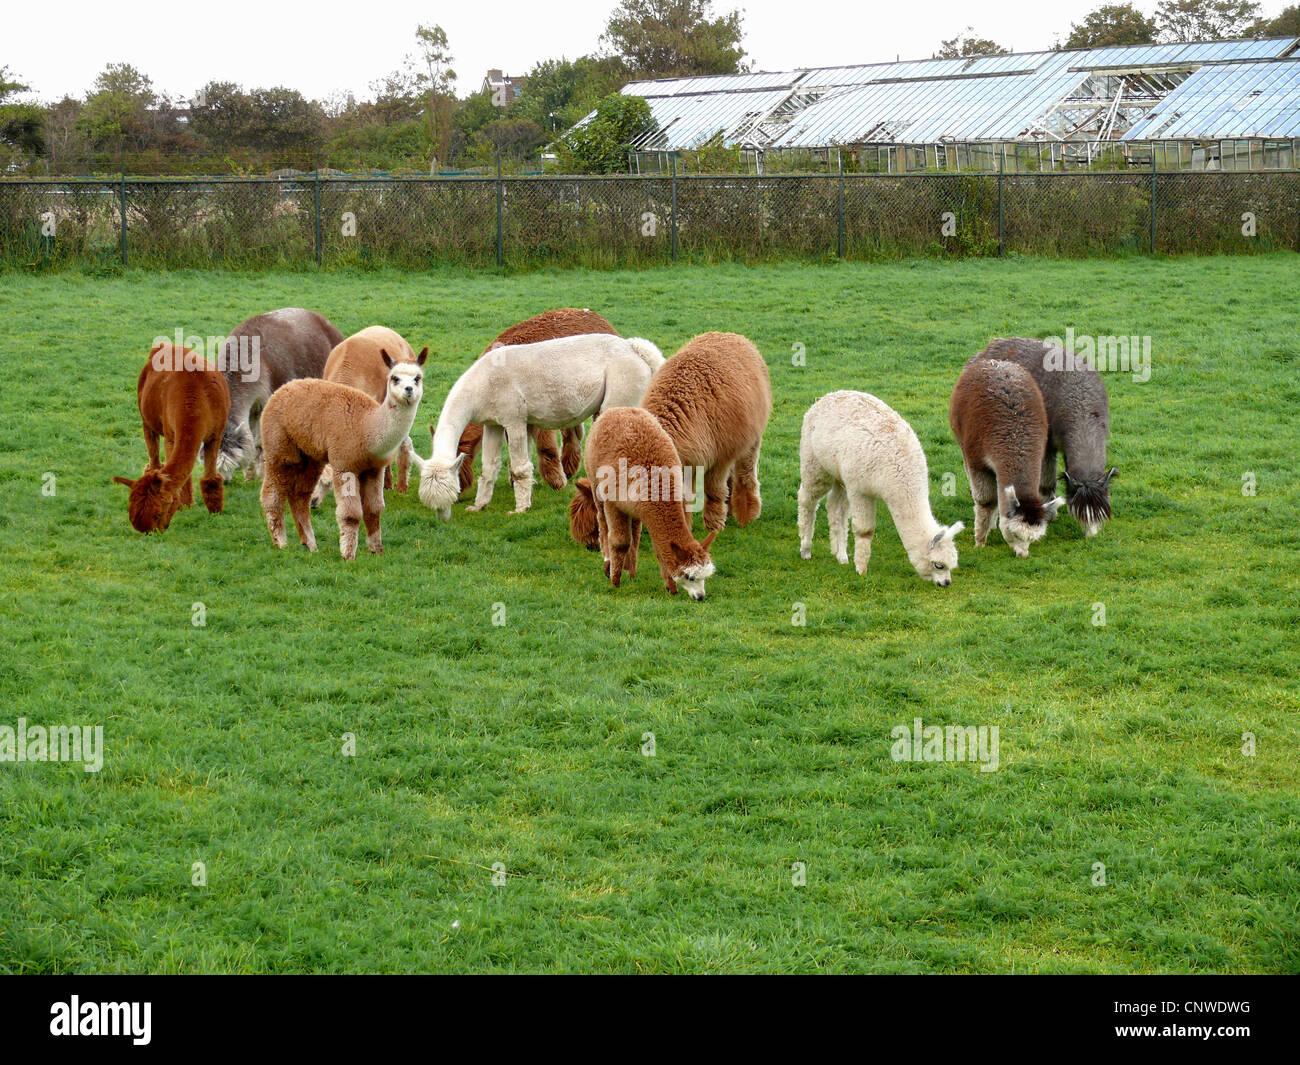 alpaca (Lama pacos), grazing herd - Stock Image